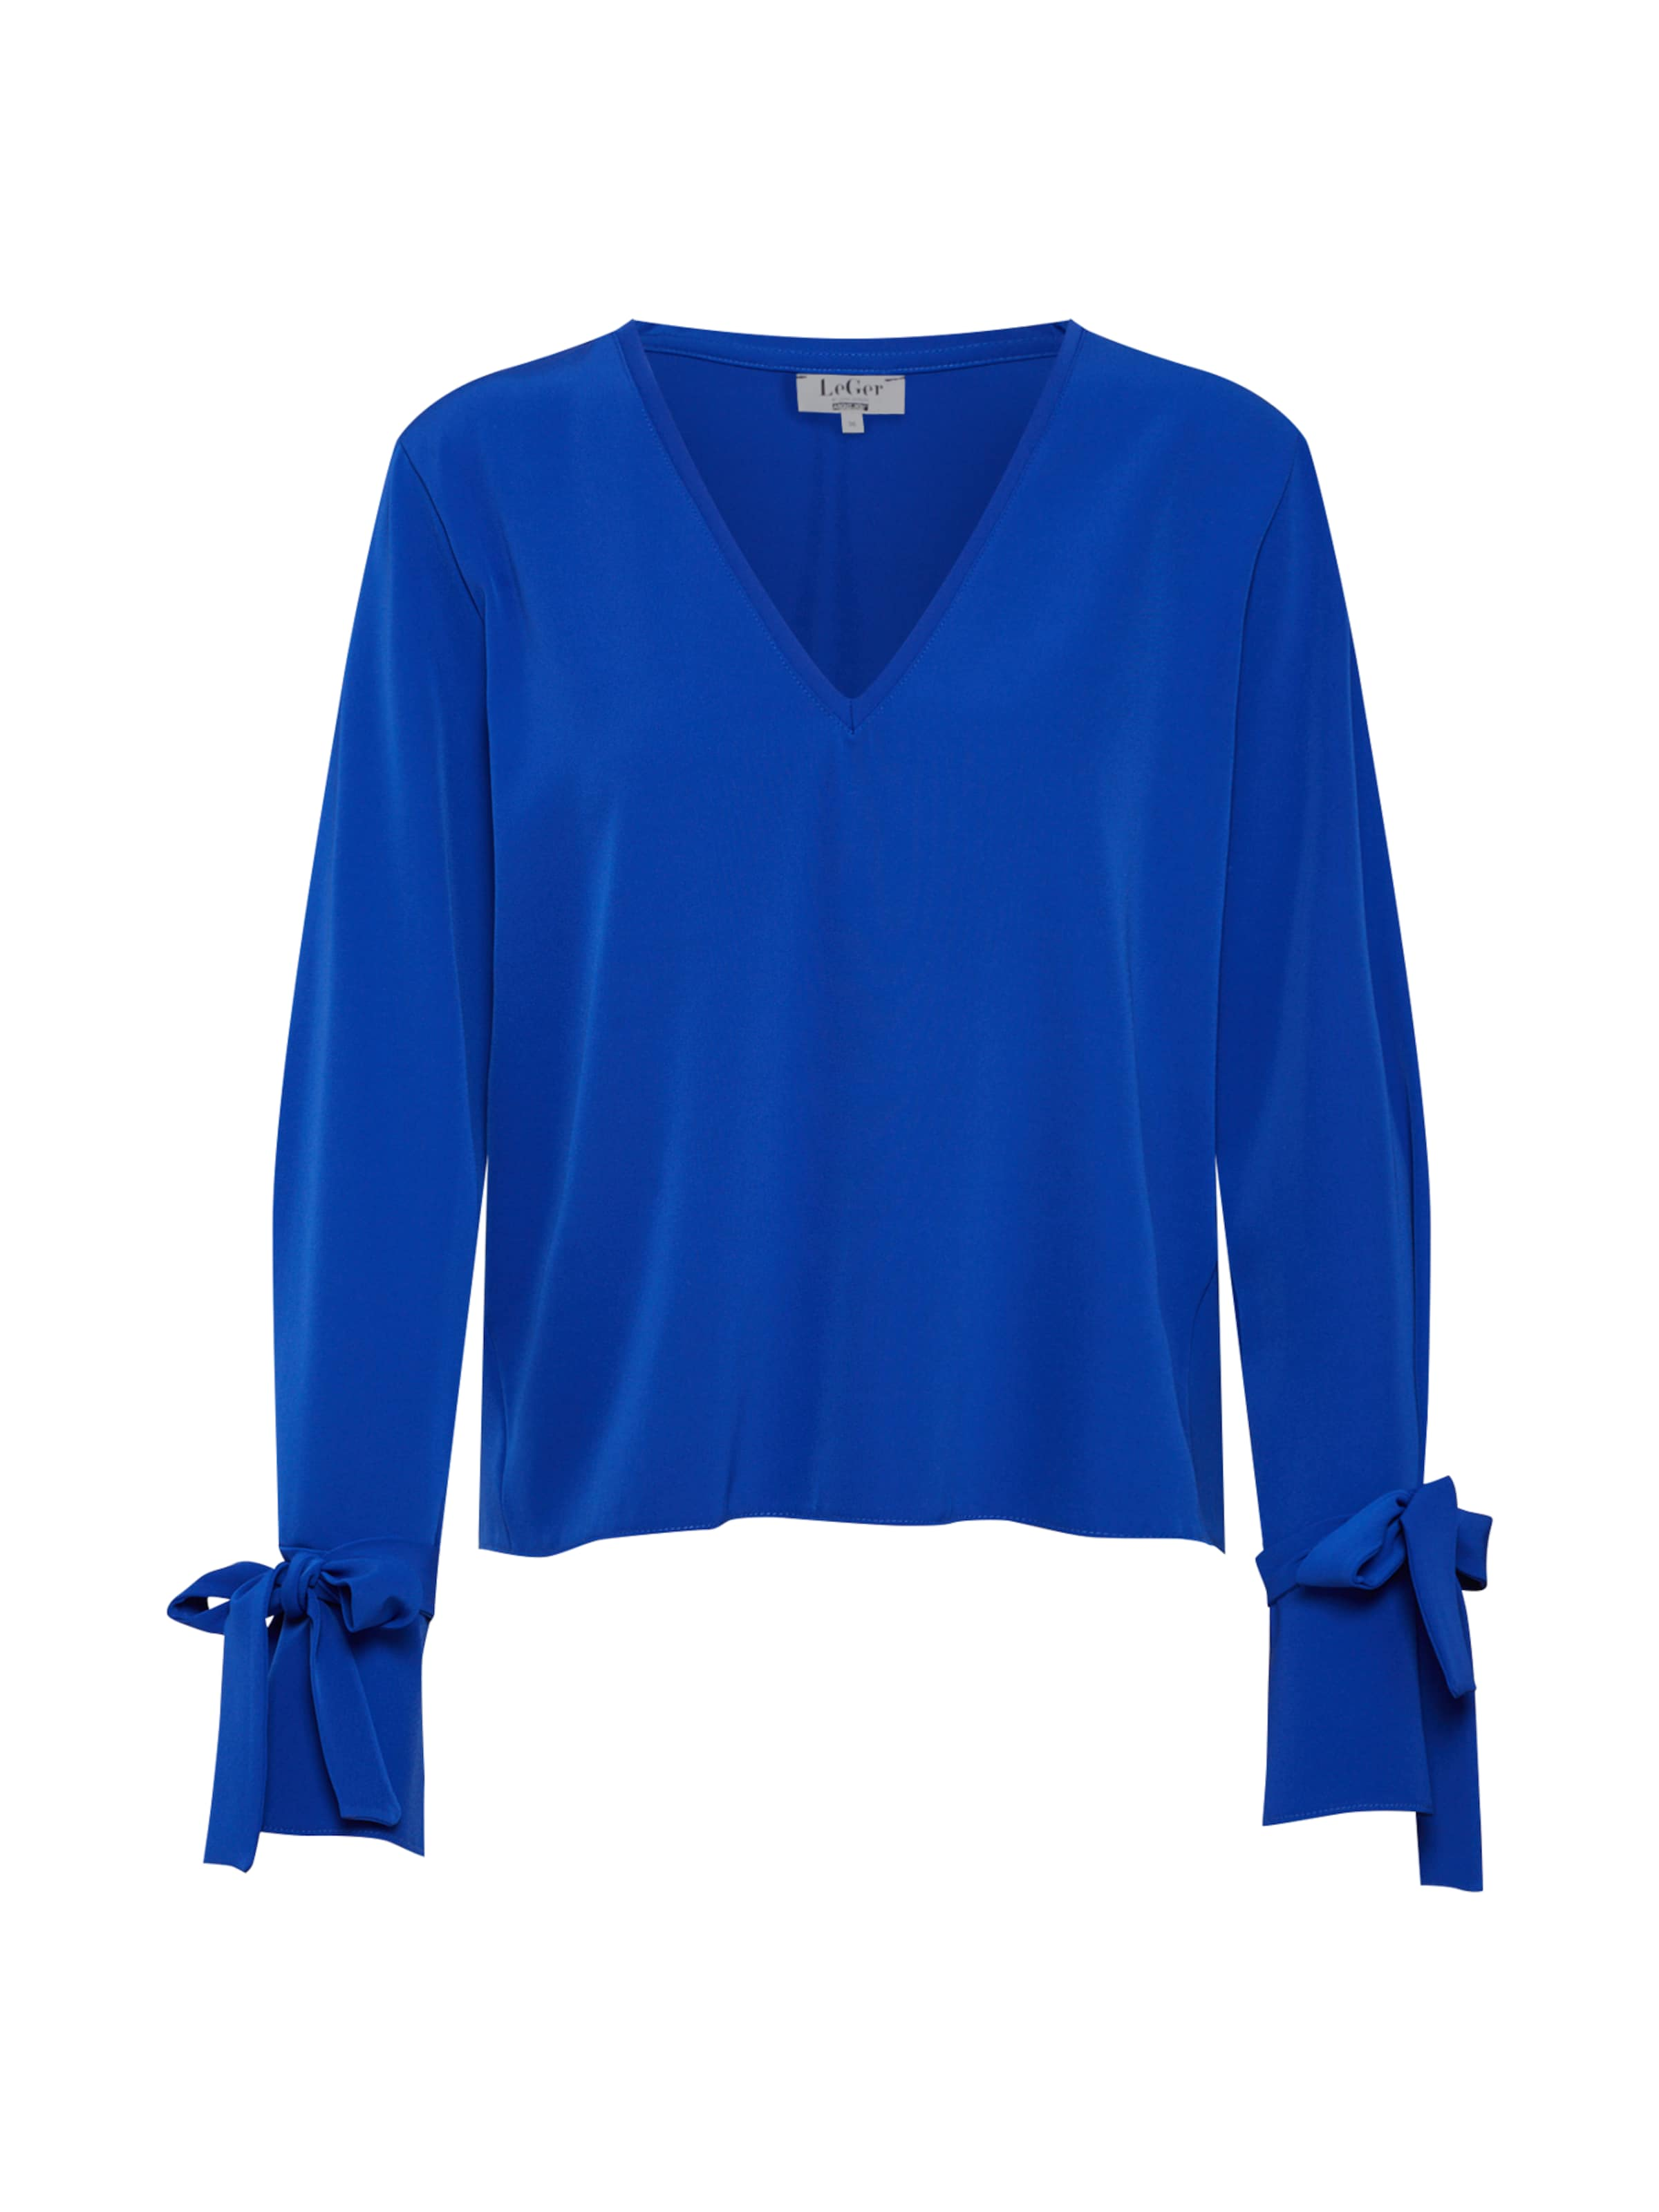 Bluse Royalblau Gercke Leger Lena By 'lene' In R4Aj5L